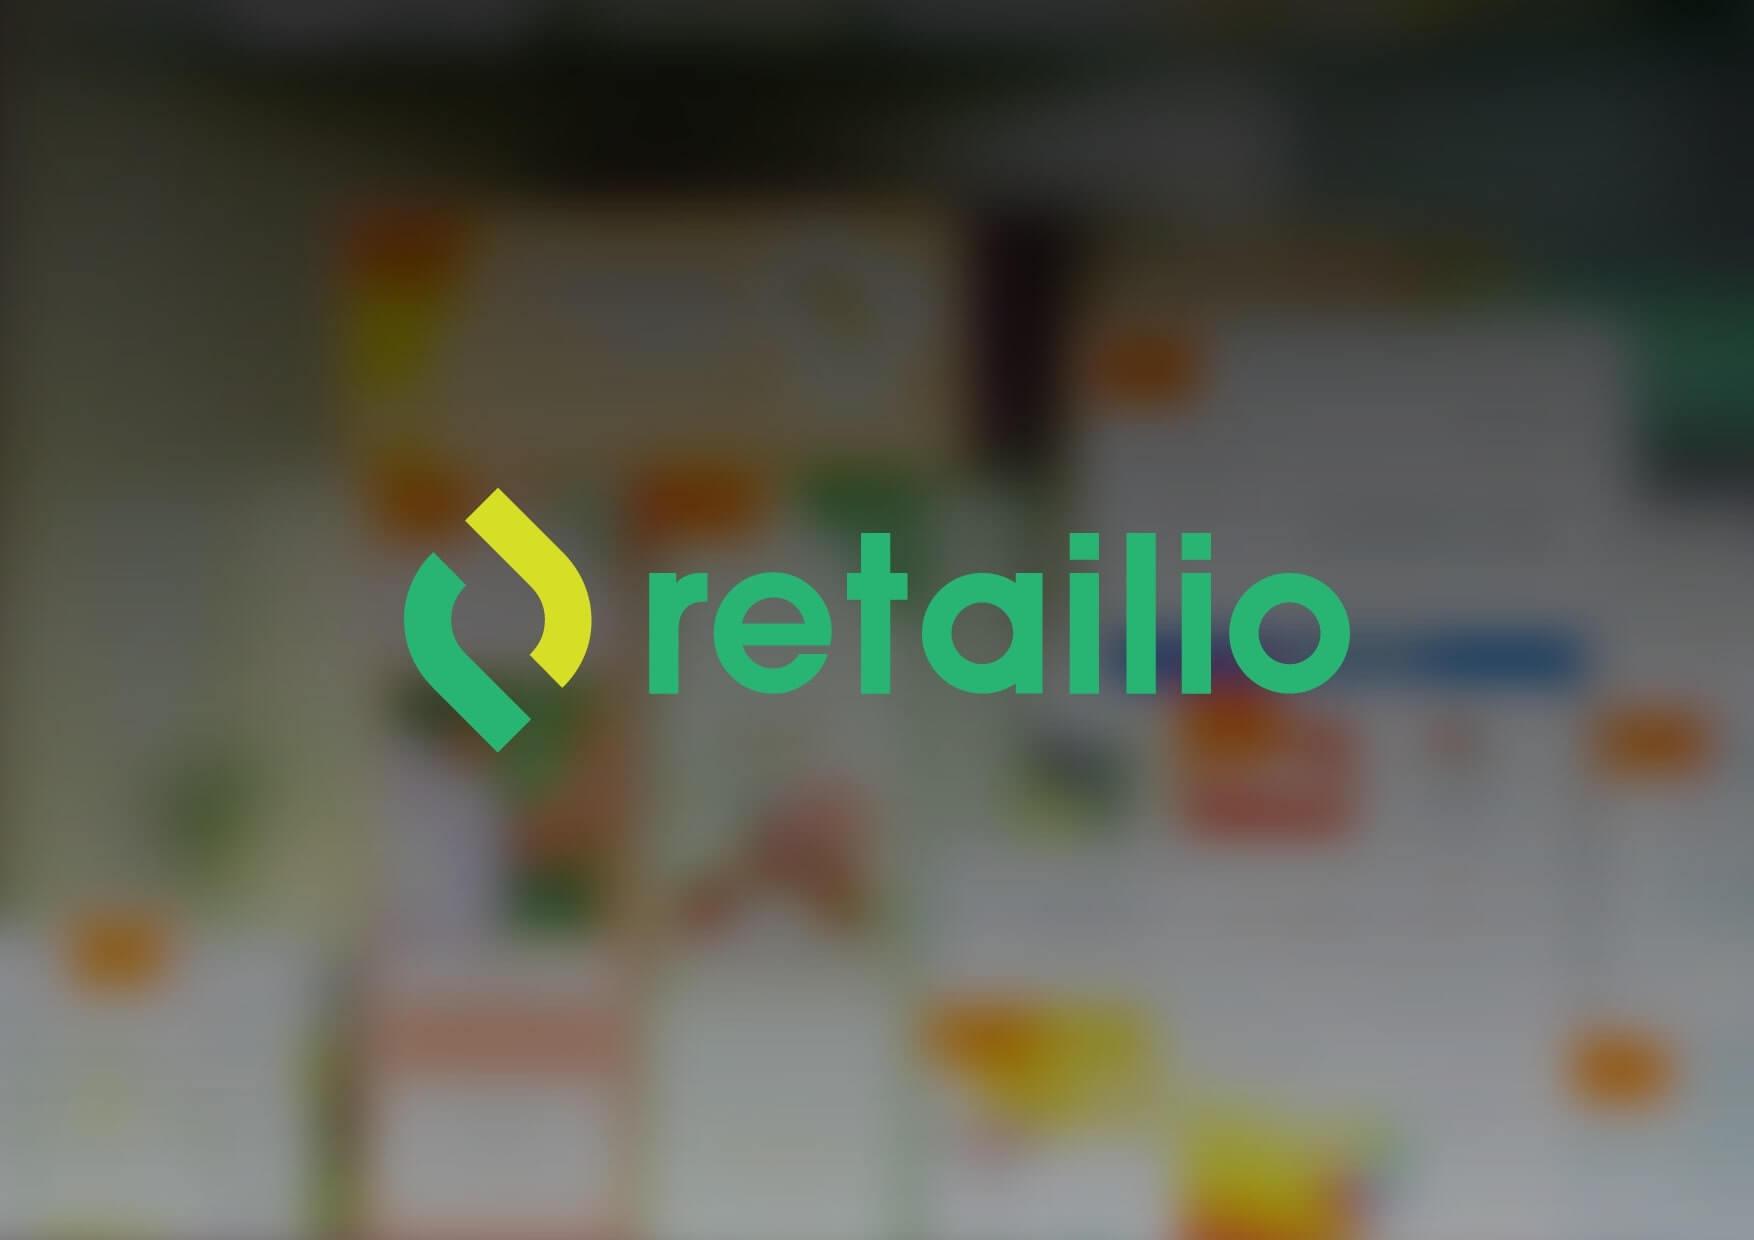 Retalio Gallery Image1